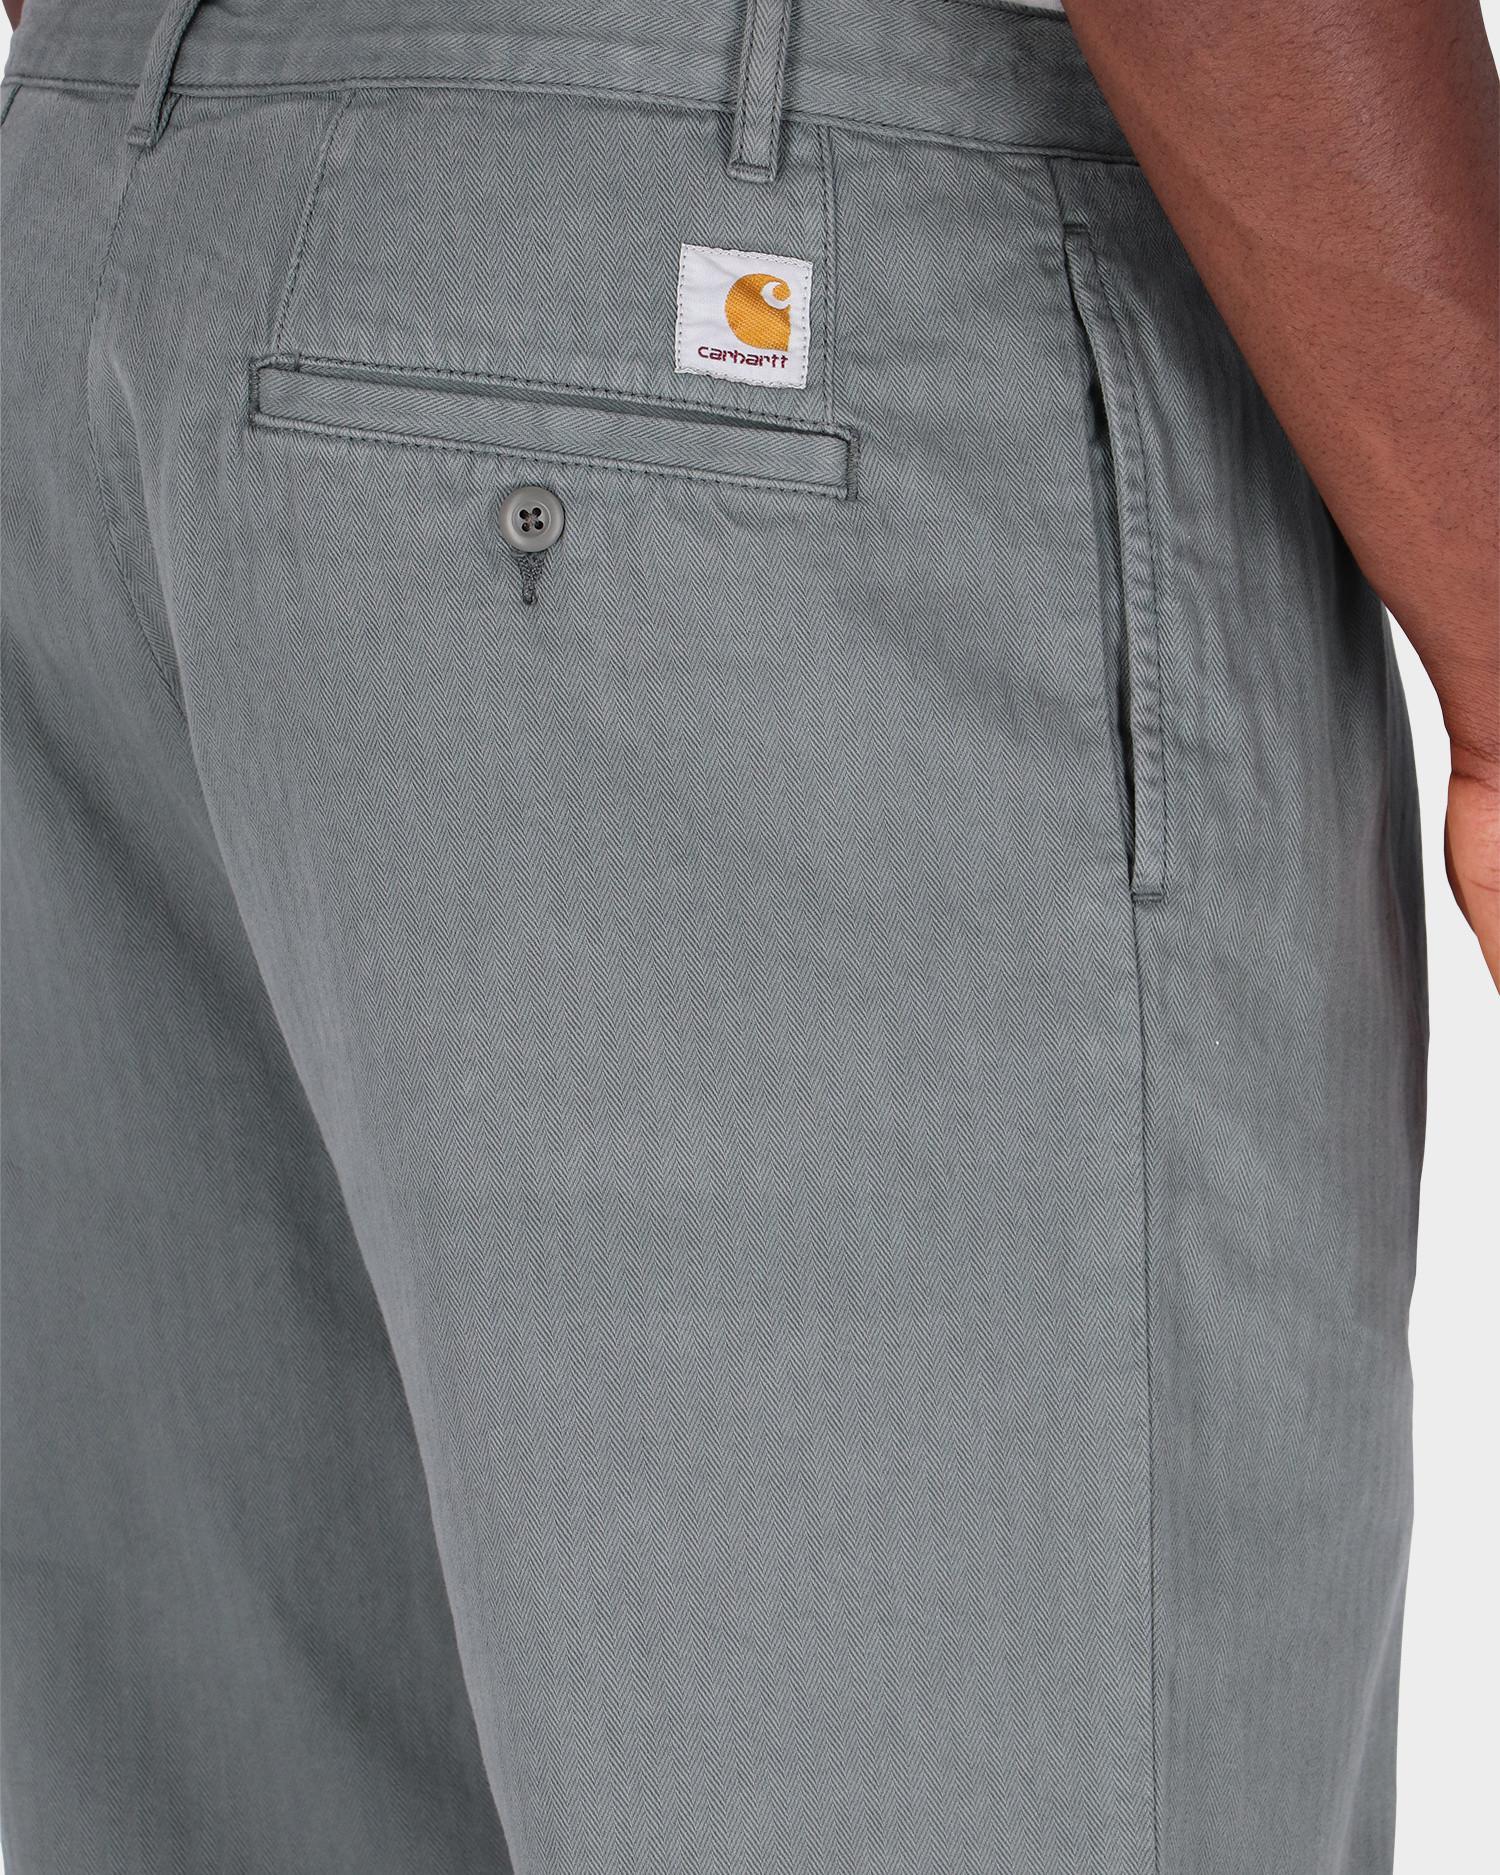 Carhartt Salford Pant Thyme Garment dyed no length